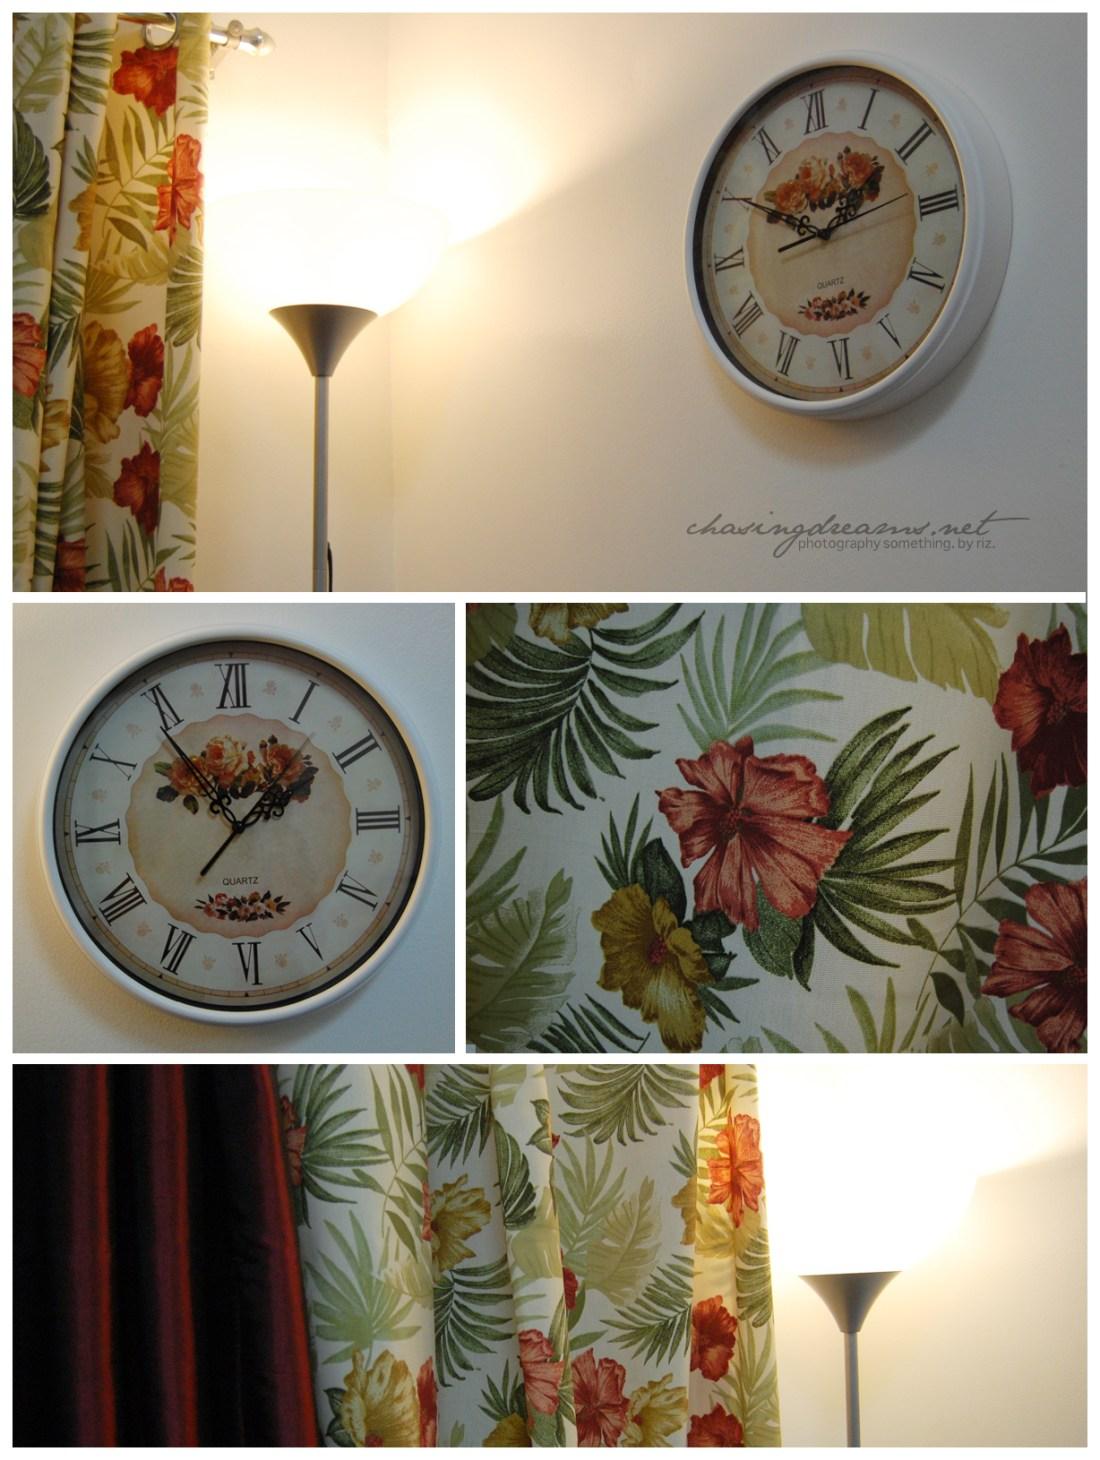 Vintage-y Curtains, Wall Clock